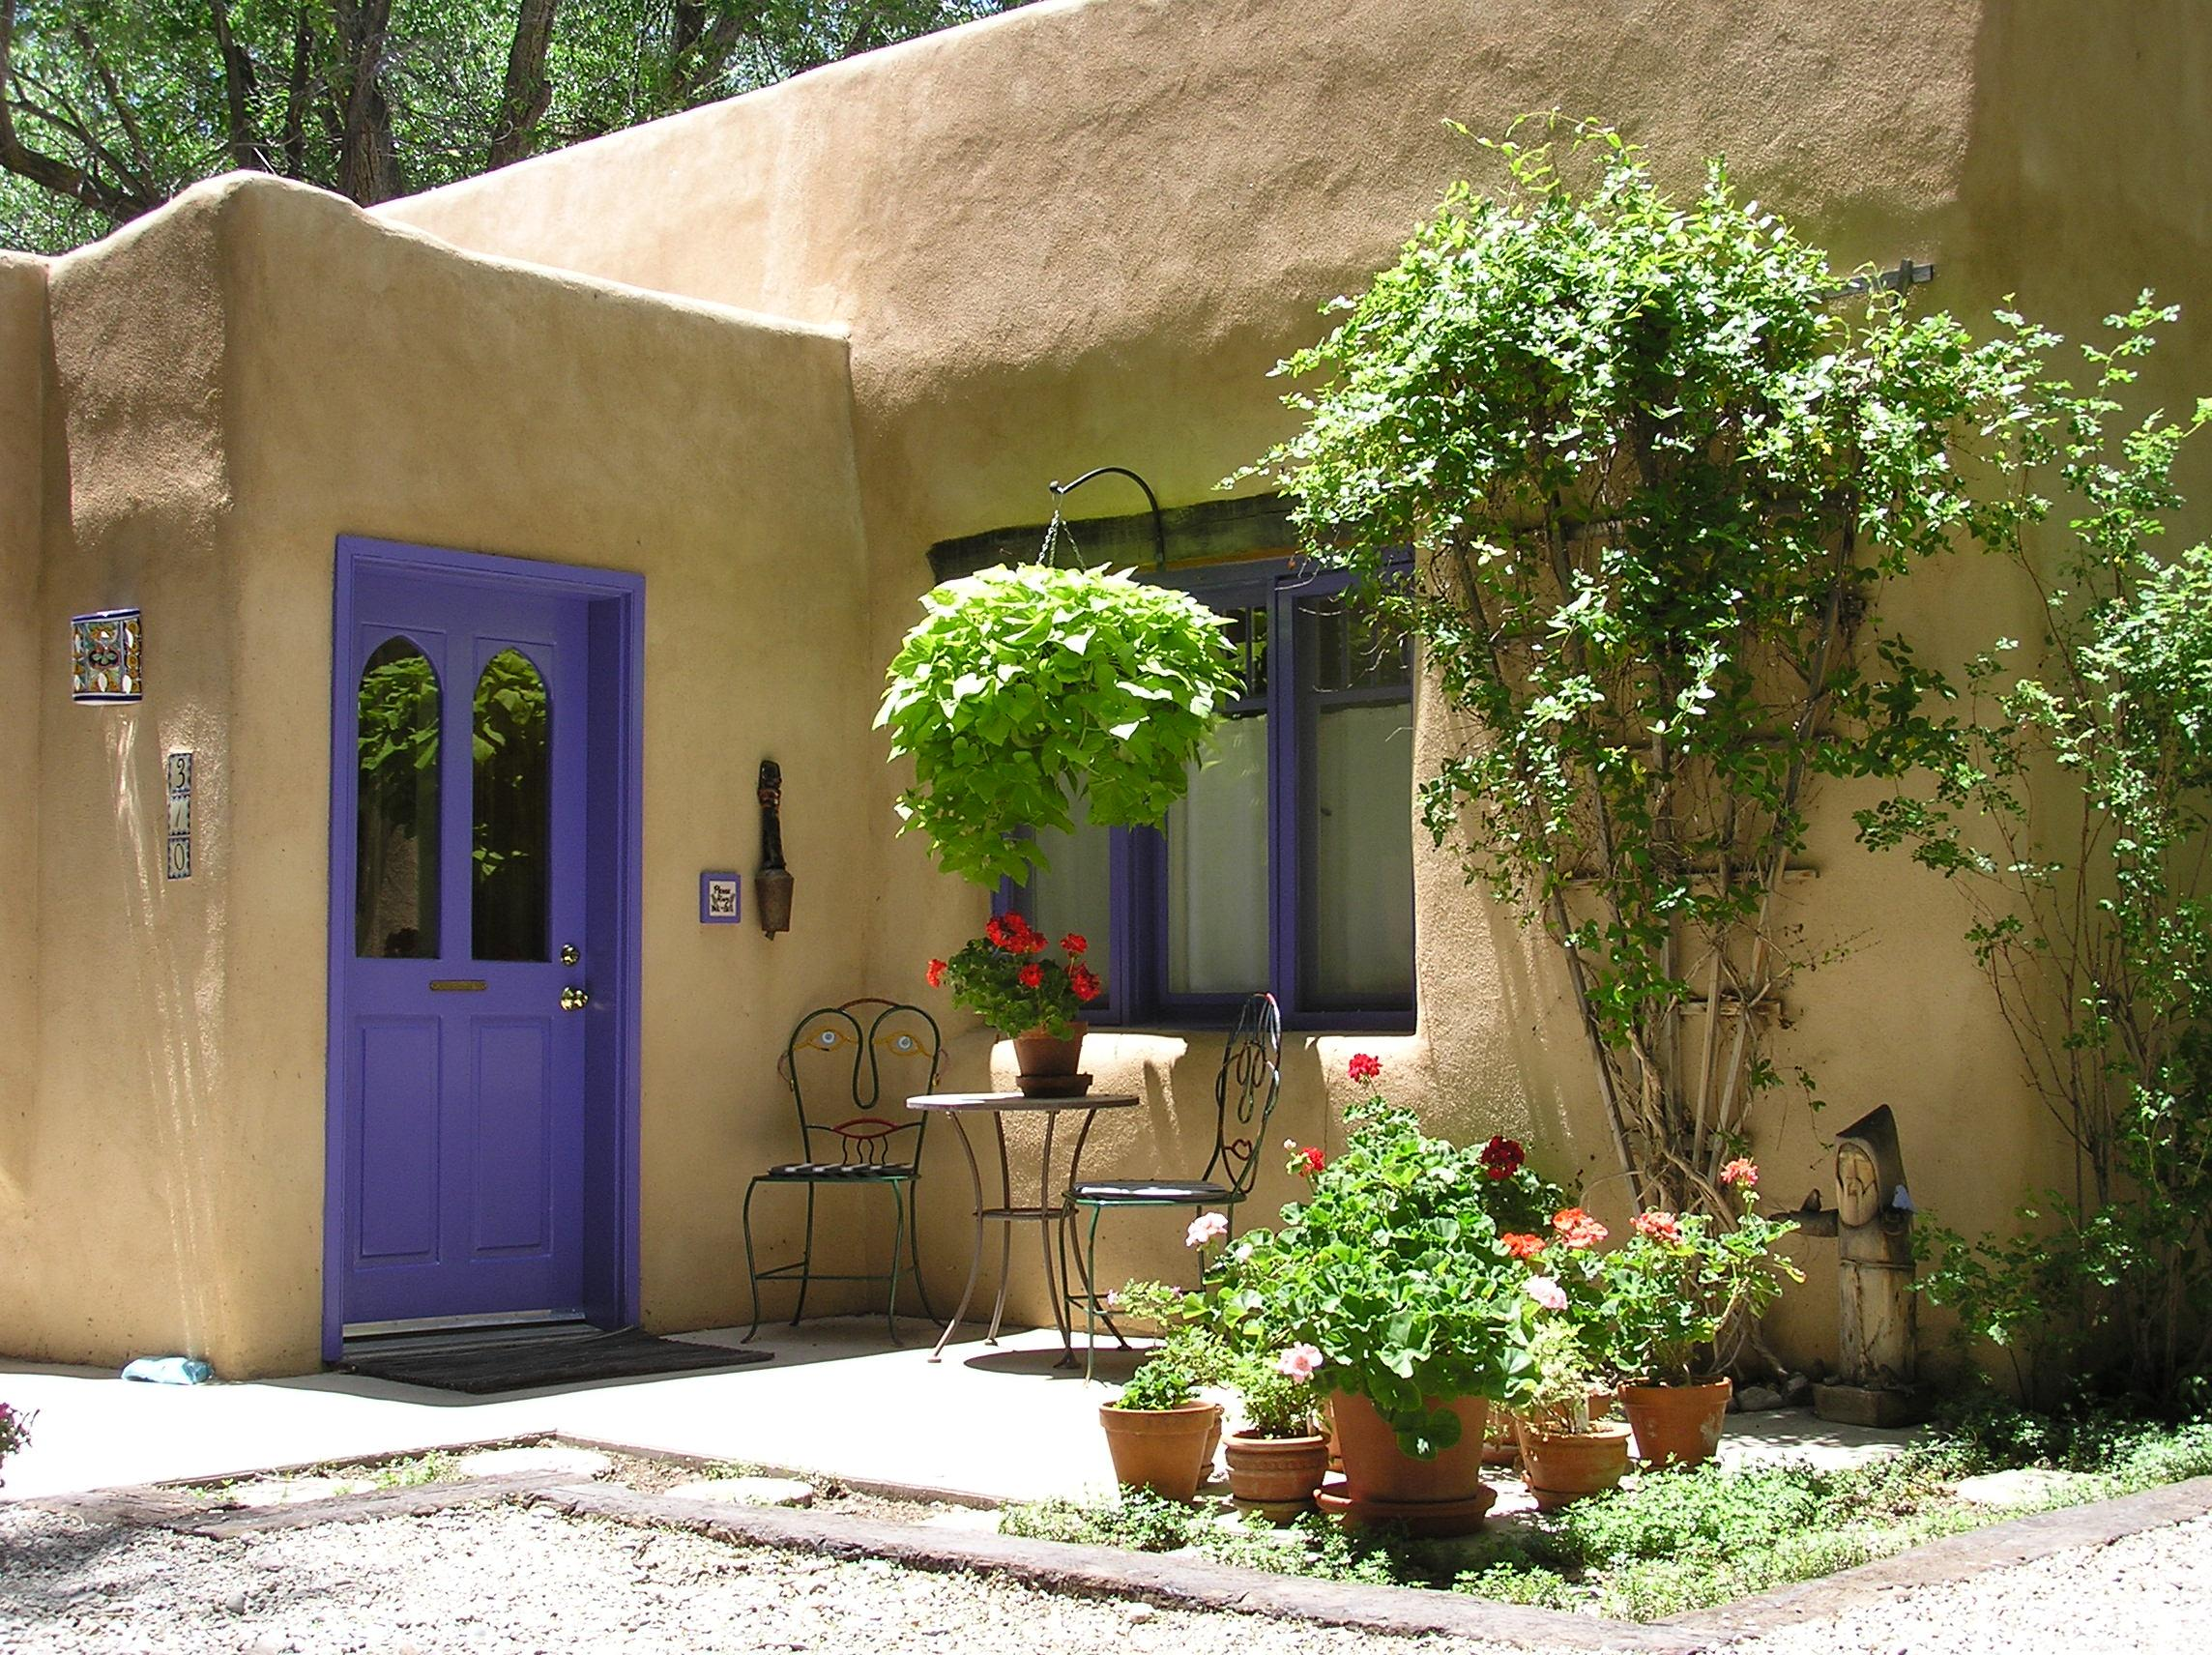 Taos New Mexico Hotels Motels